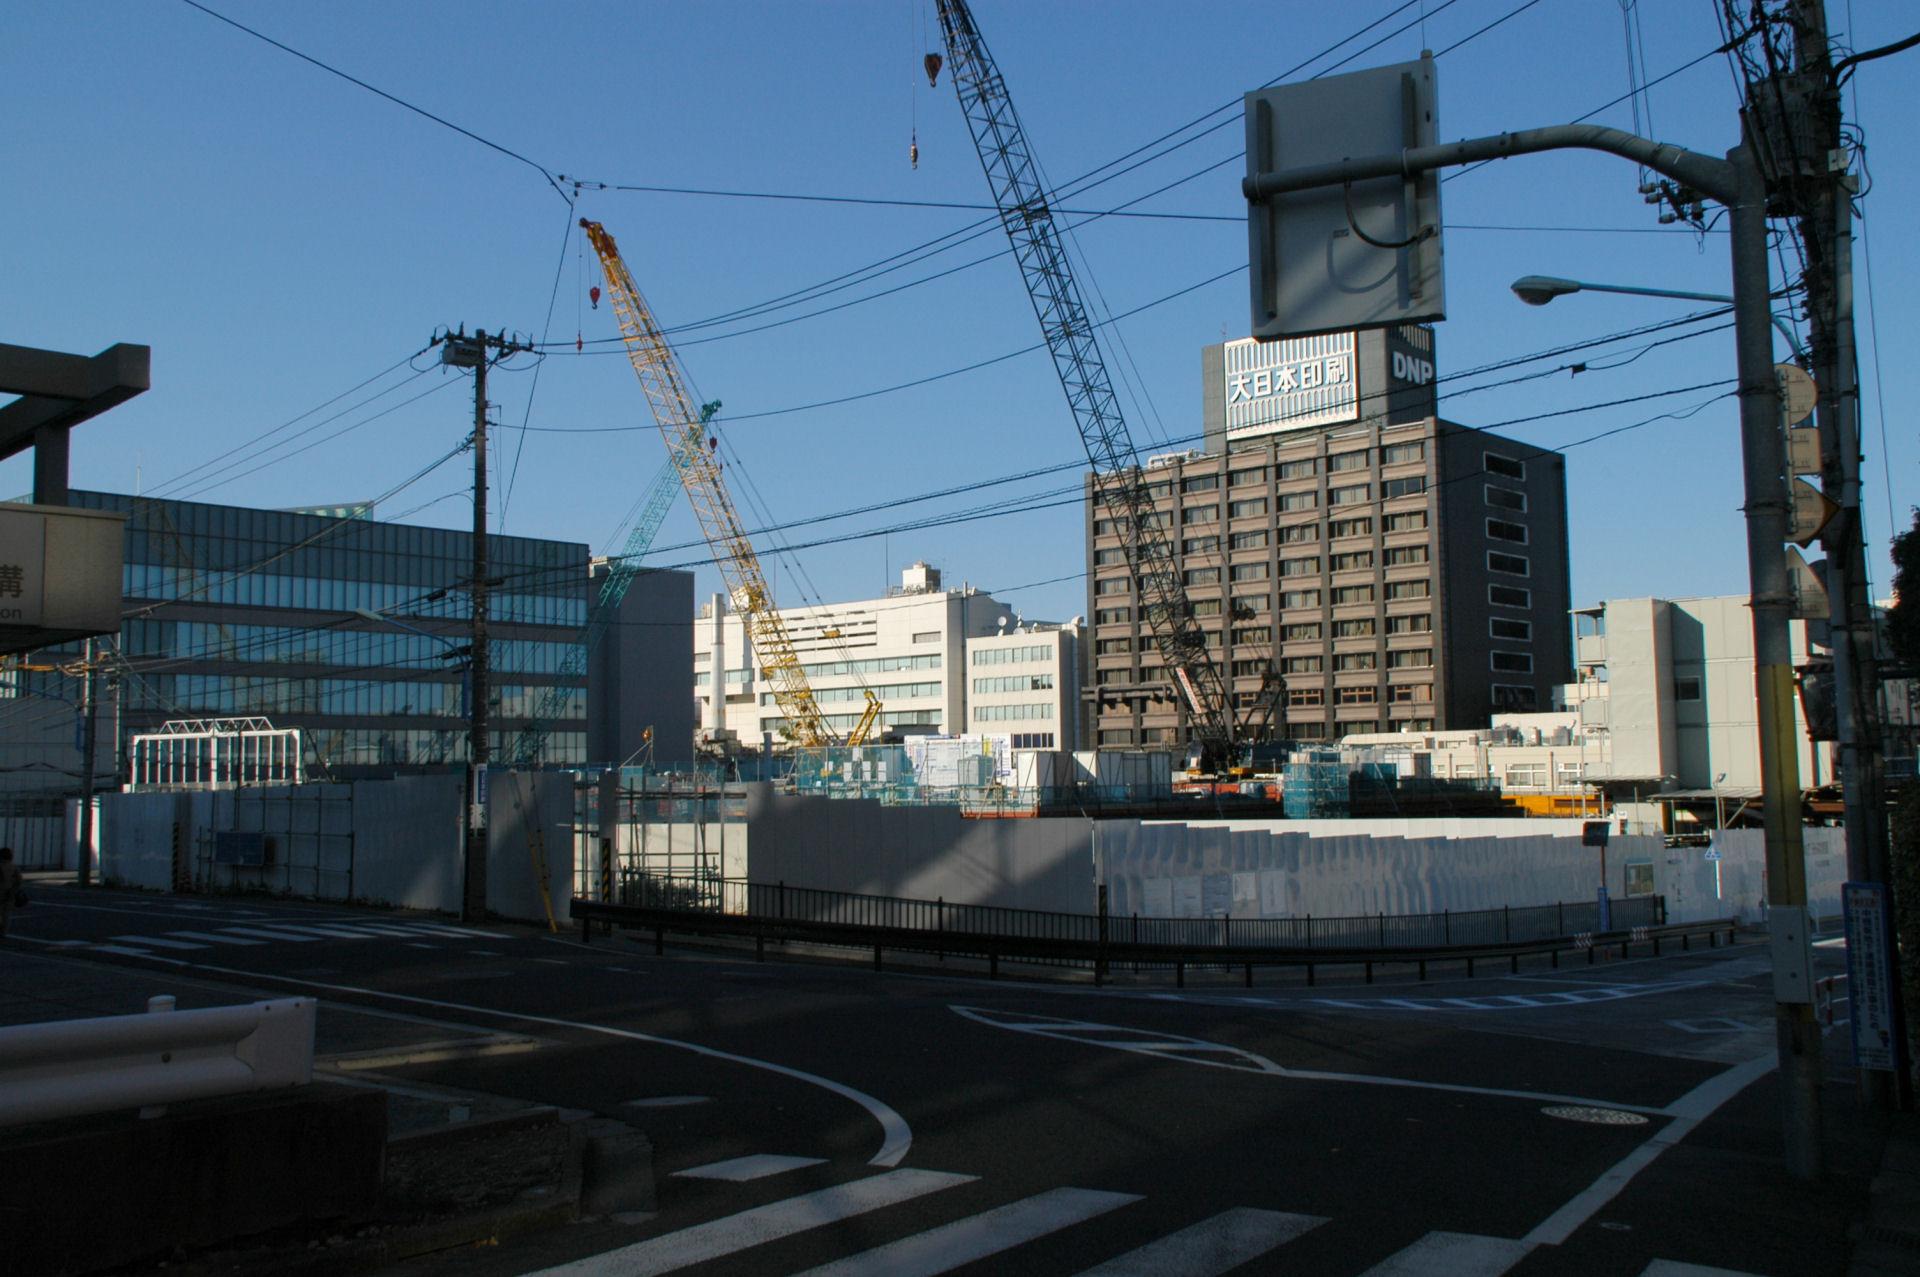 ichigaya13120102e.jpg